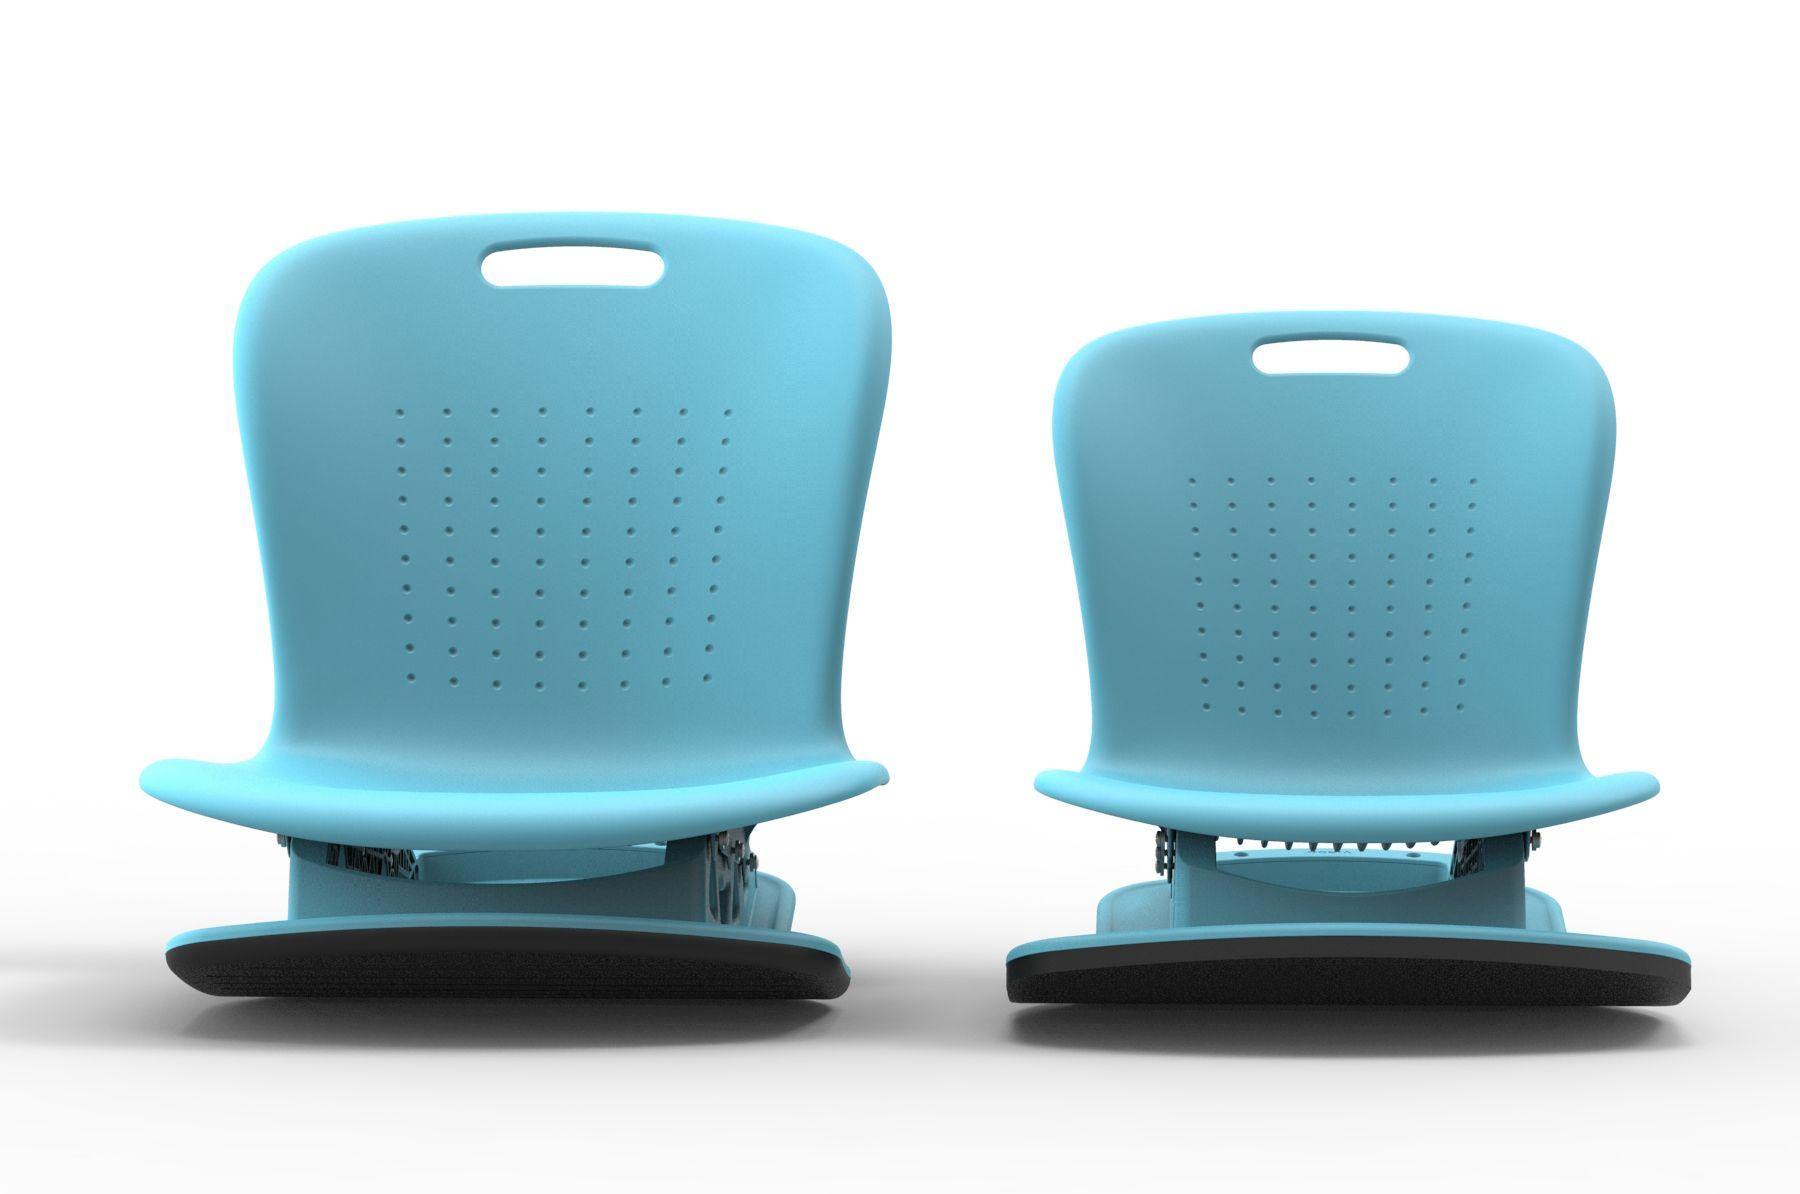 Virco S Sage Series Floor Rocker For A Flexible Seating Classroom